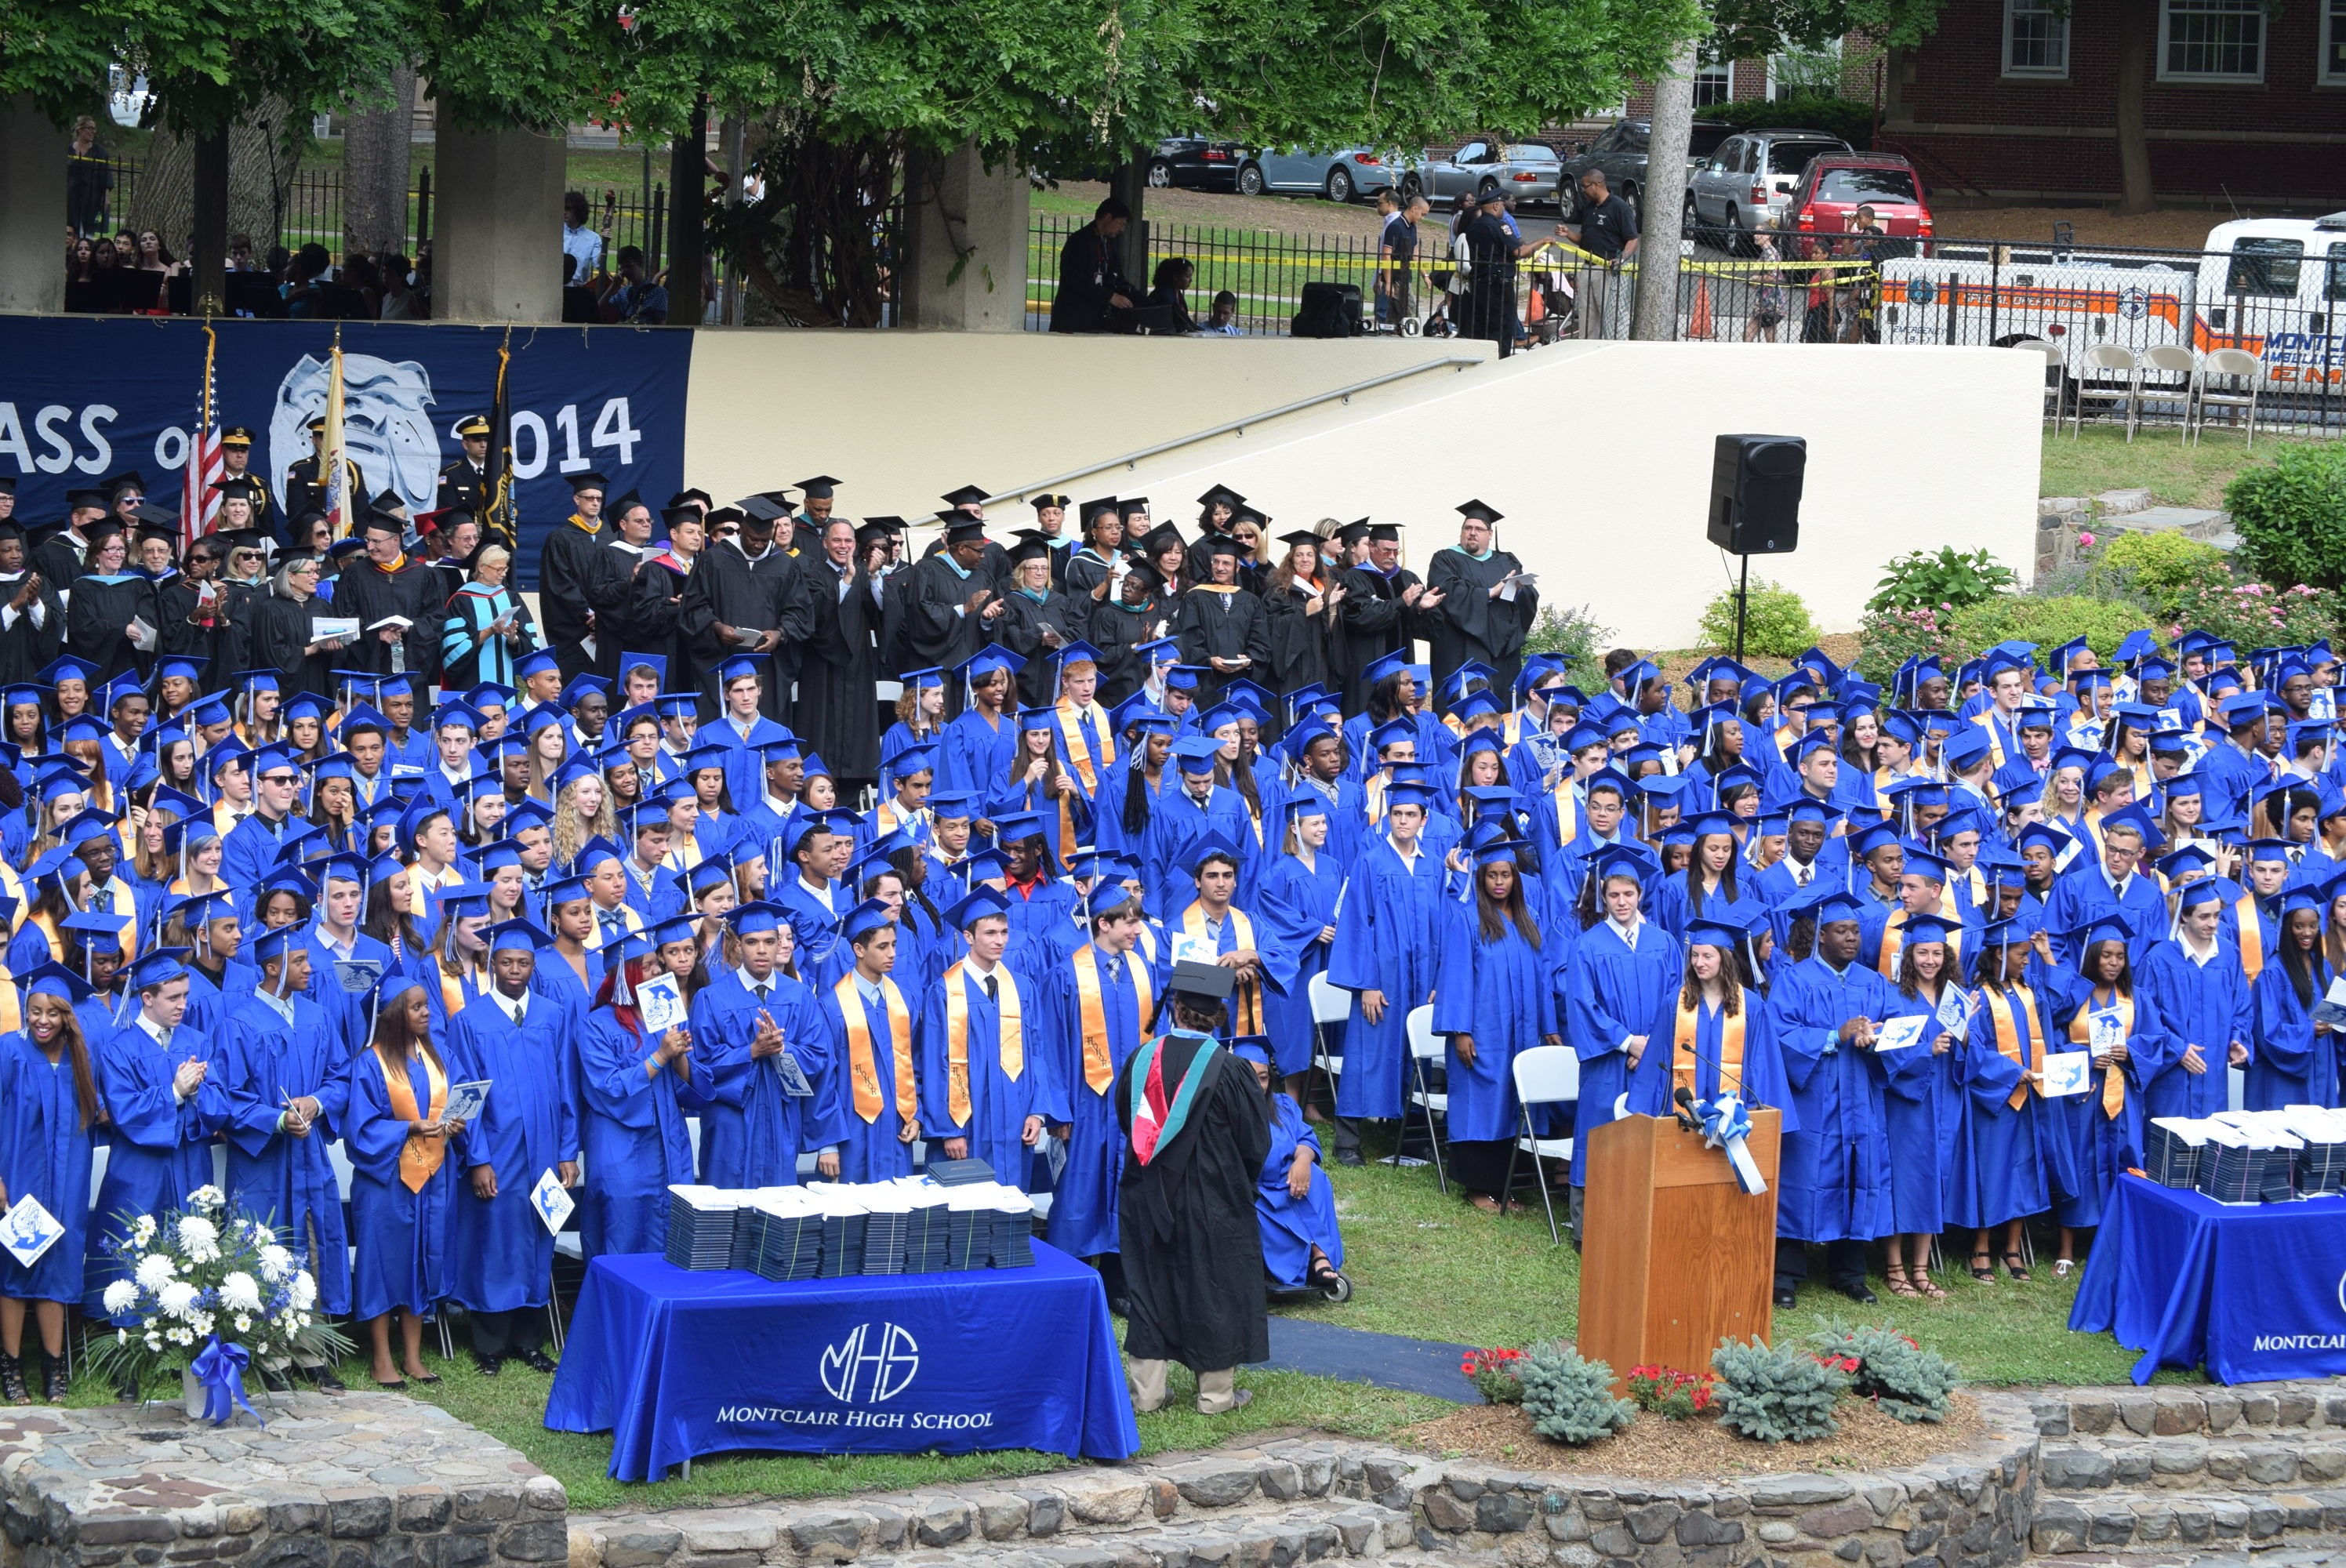 a007c7a80744c661c0d4_MHS_graduation.6.23.14_007.jpg